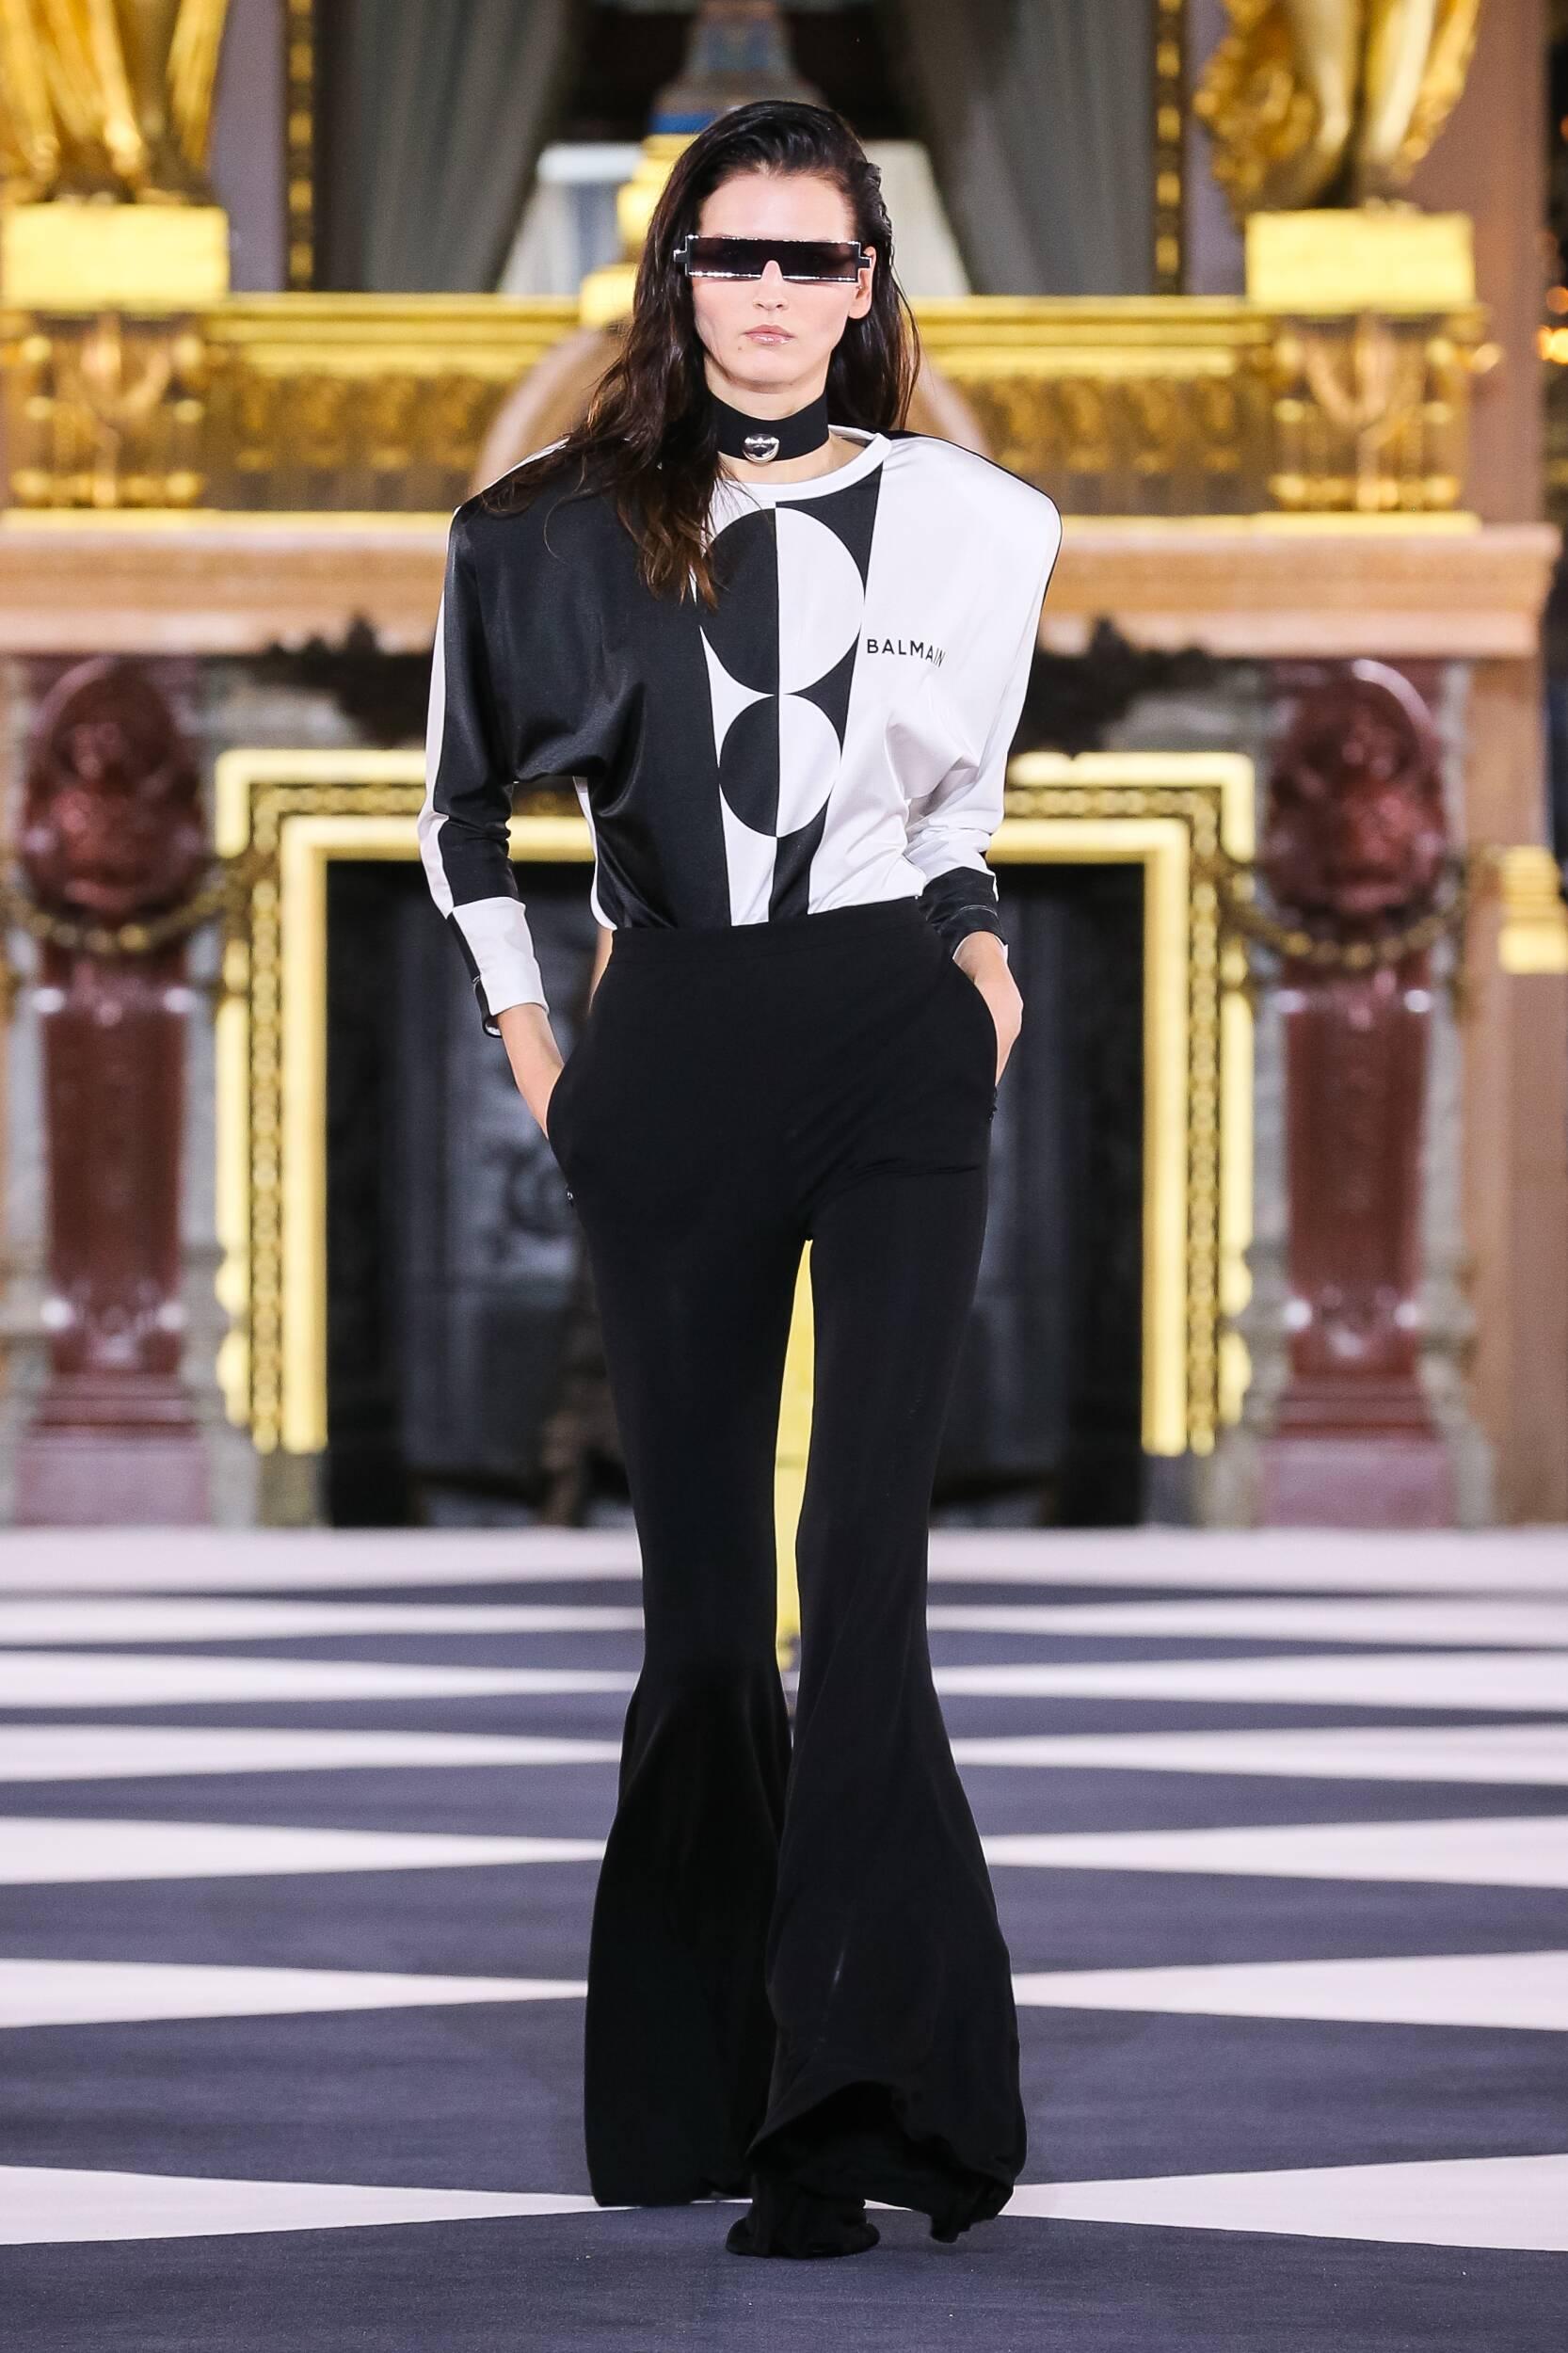 Balmain Spring Summer 2020 Collection Paris Fashion Week